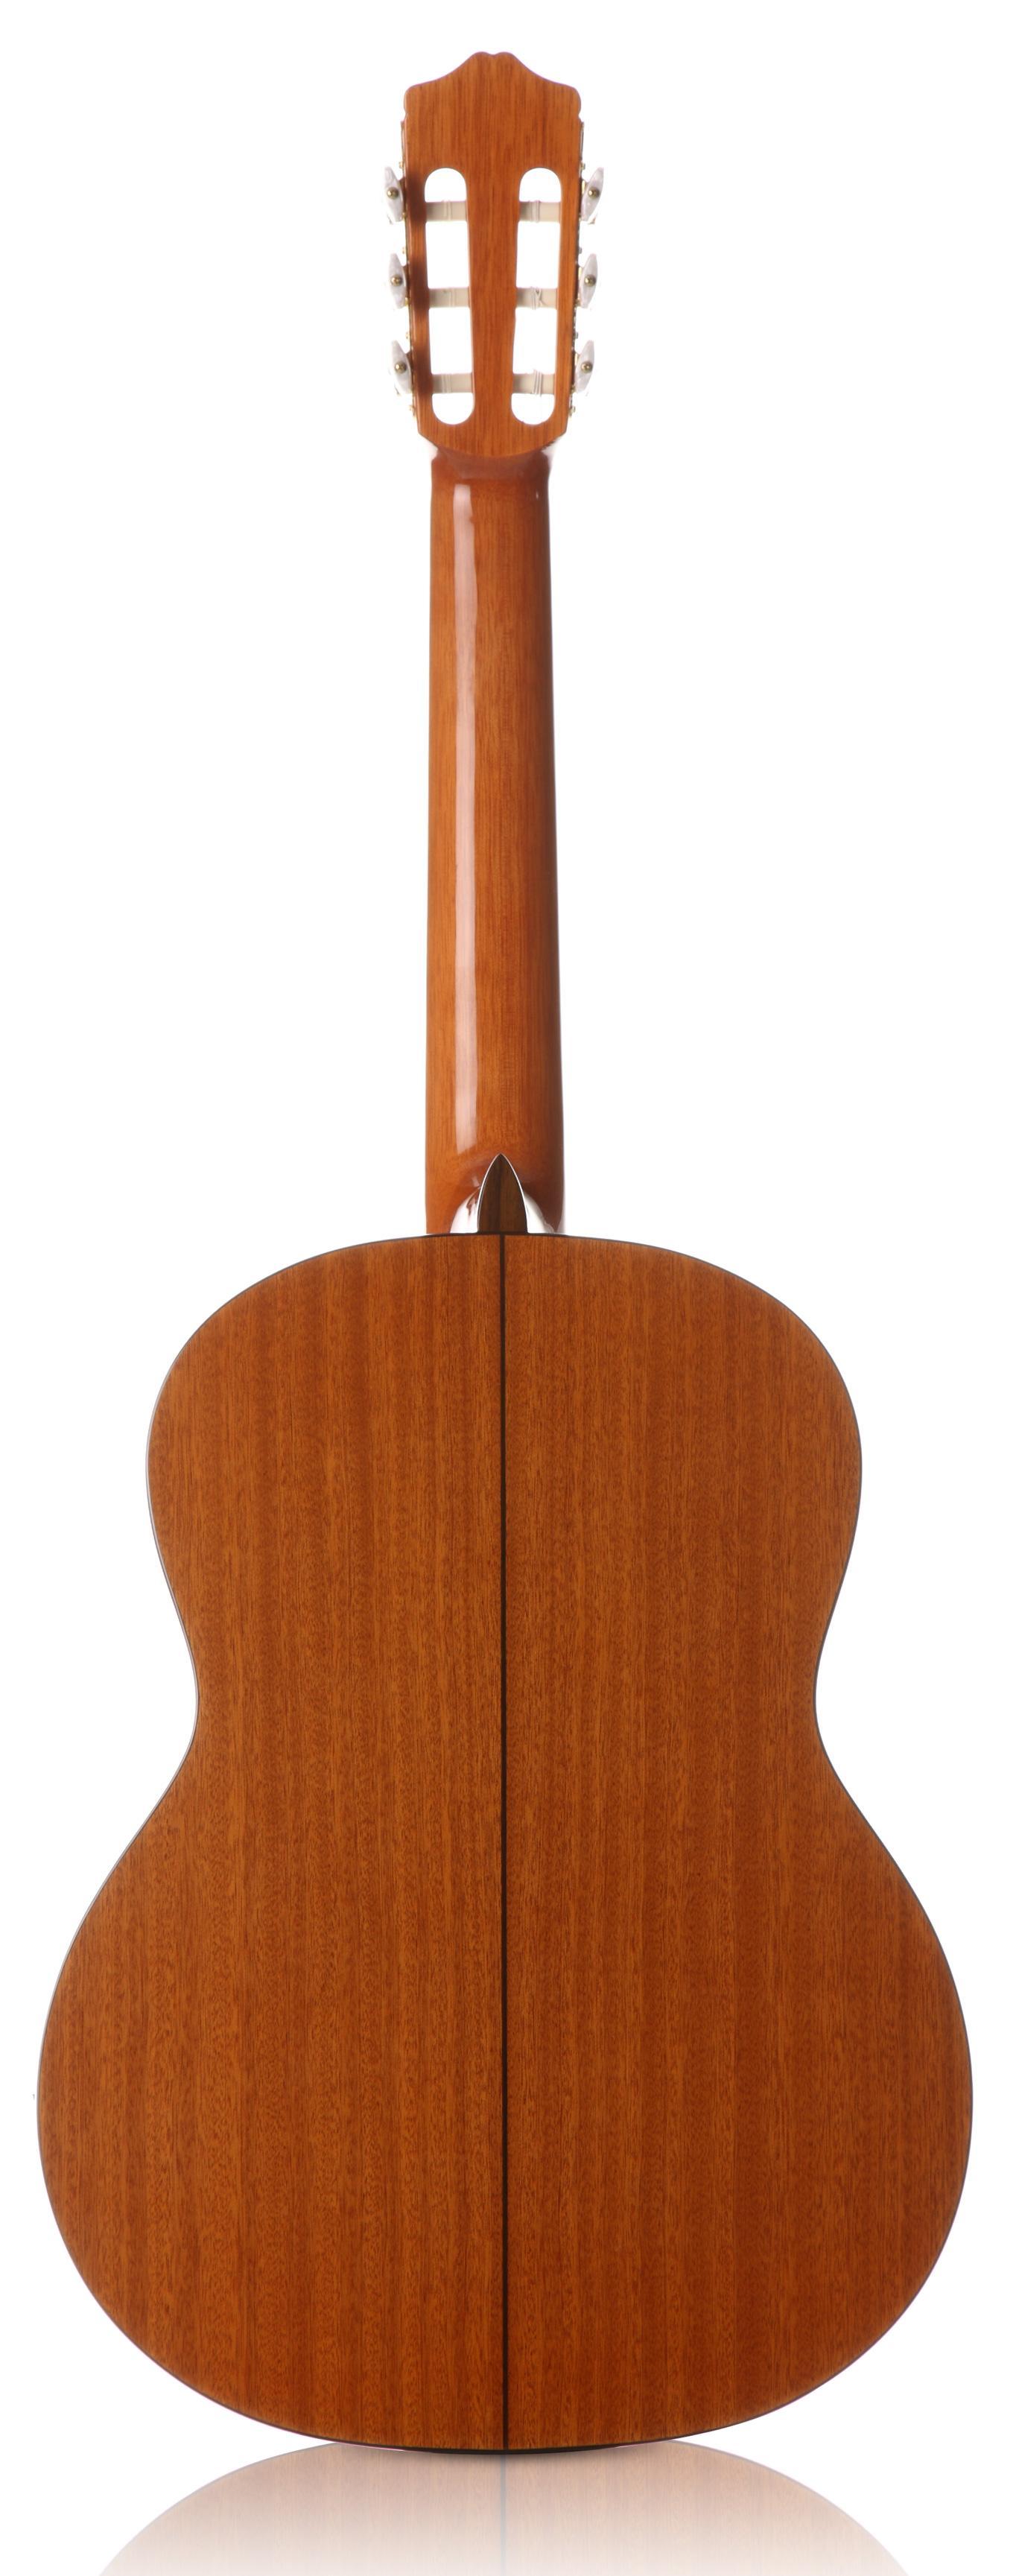 Cordoba c5 nylon string classical guitar natural live louder cordoba c5 nylon string classical guitar sciox Gallery